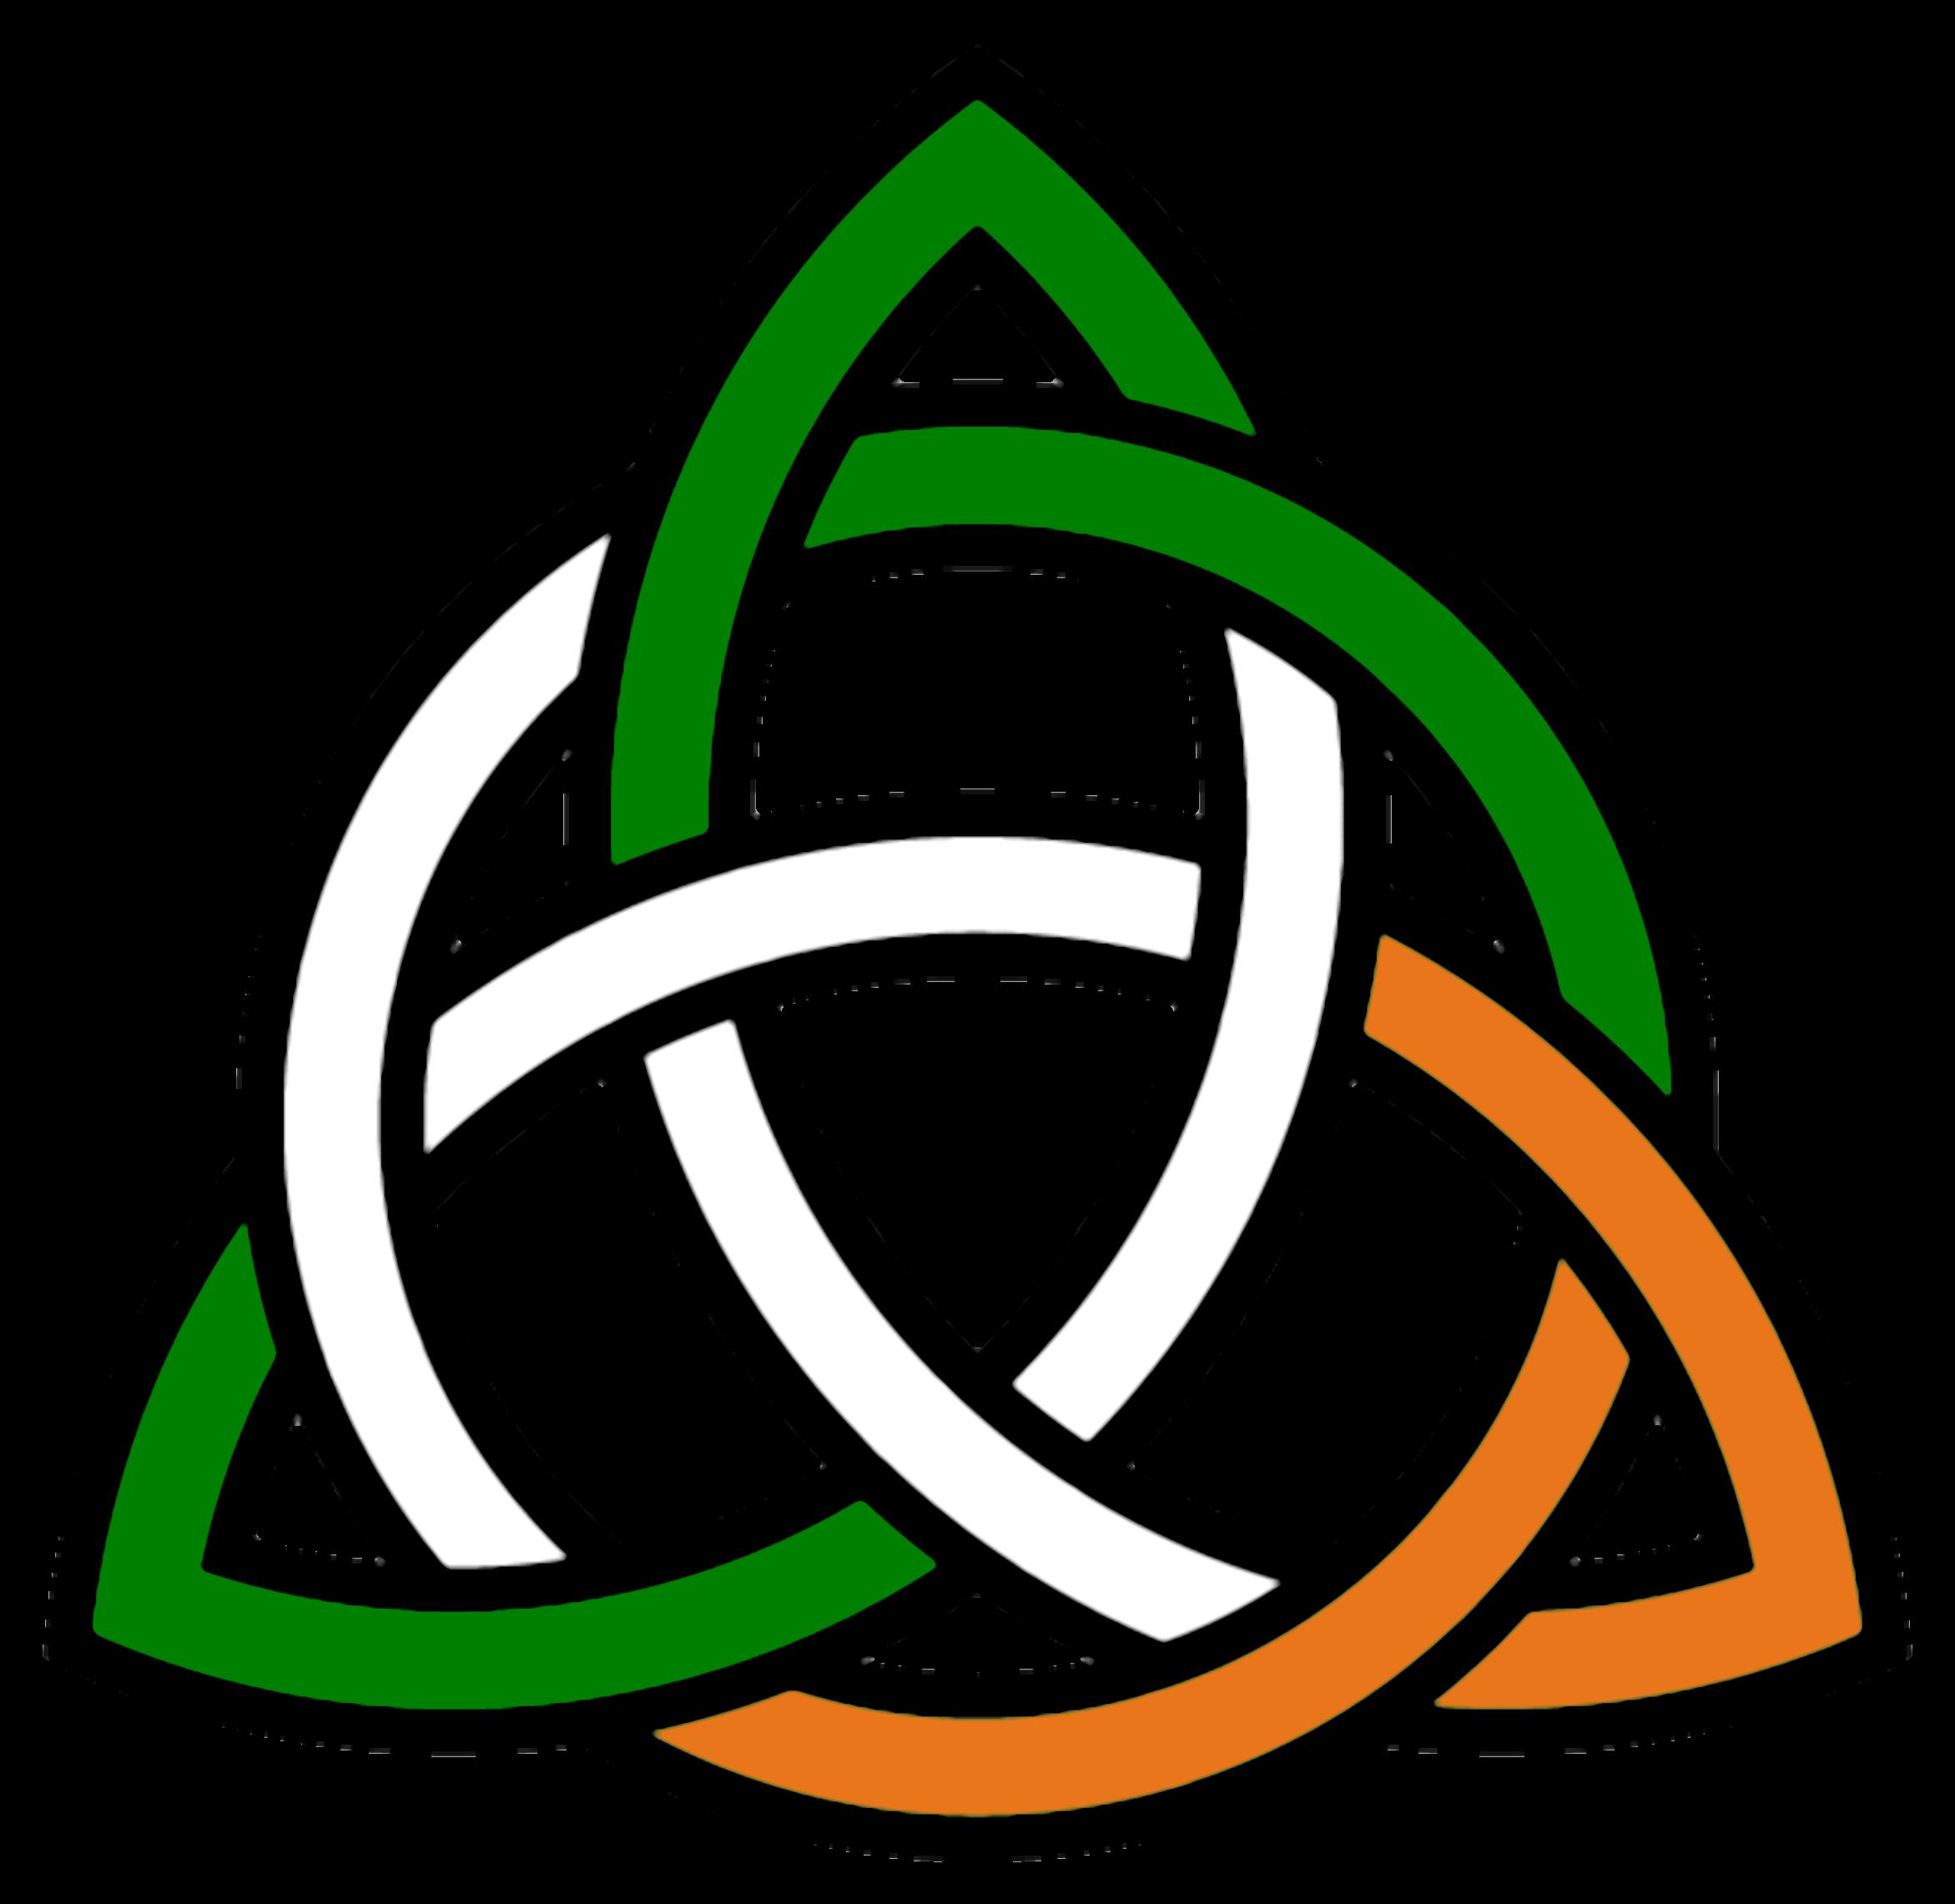 Irish knot clipart jpg transparent download Celtic Trinity Knot Clipart Irish Knot Flag Image Vector | Tatoos ... jpg transparent download